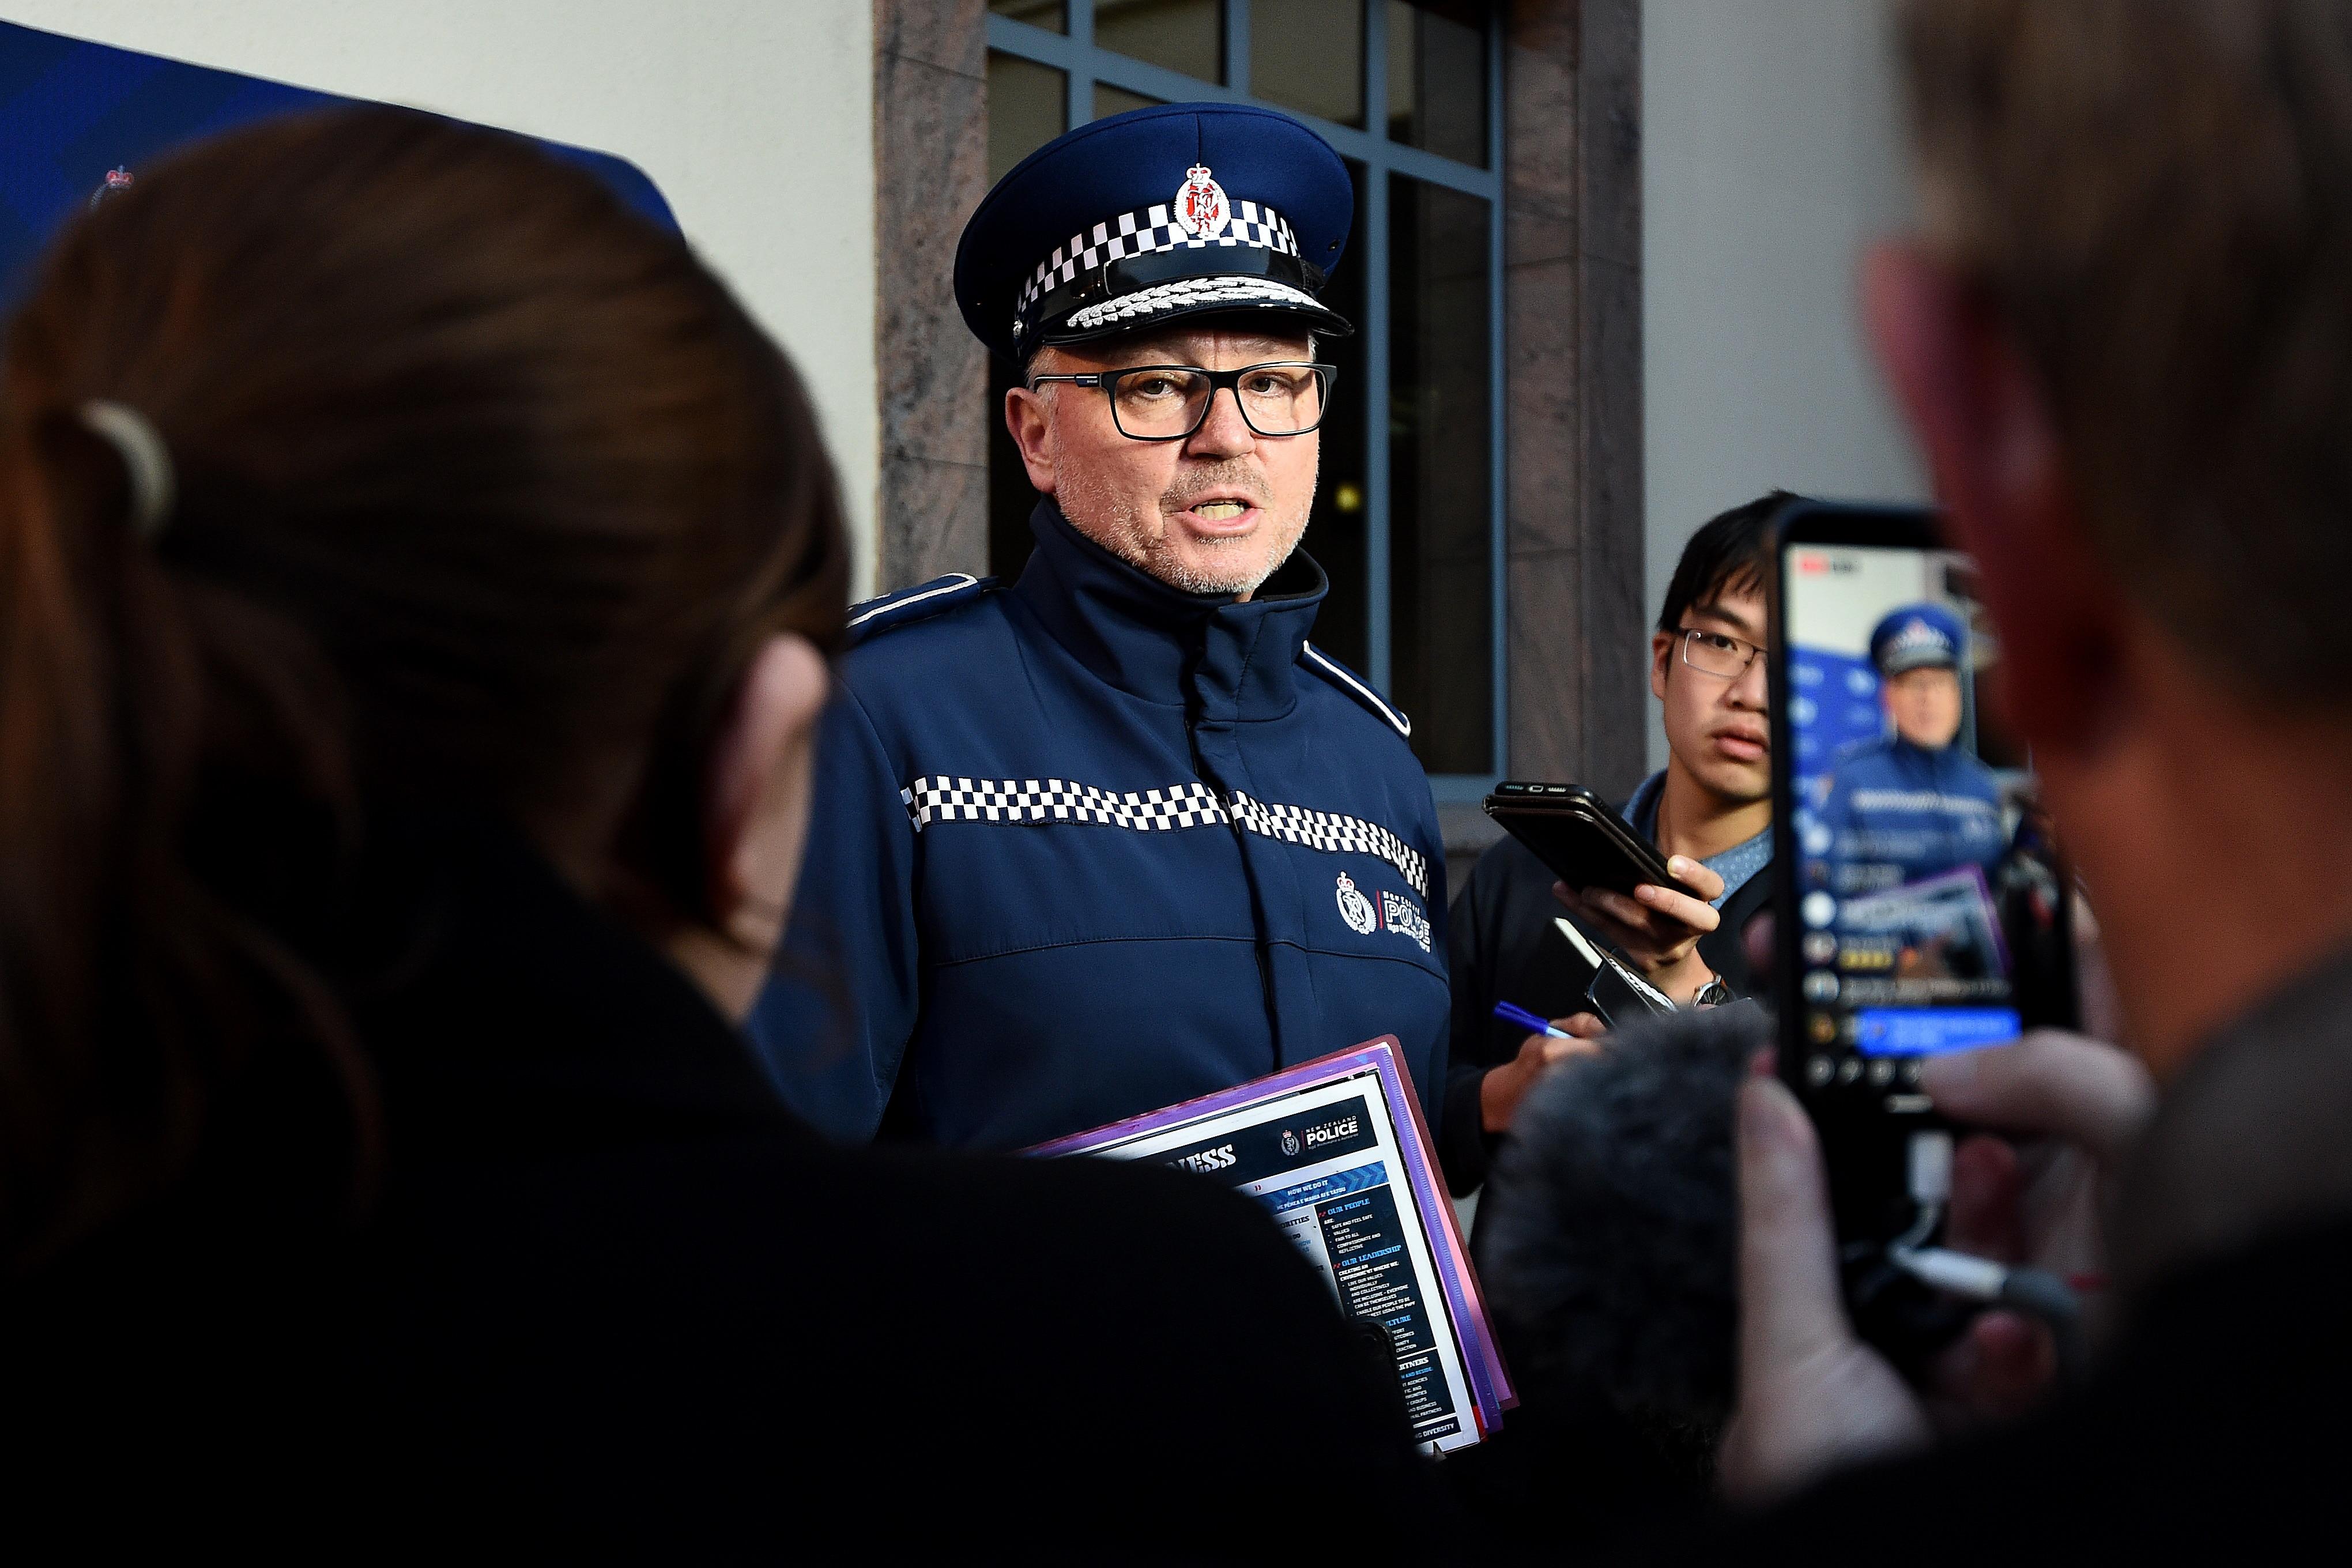 Superintendent Paul Basham speaks to media outside the Dunedin Central Police Station on 10 May, 2021 in Dunedin, New Zealand.